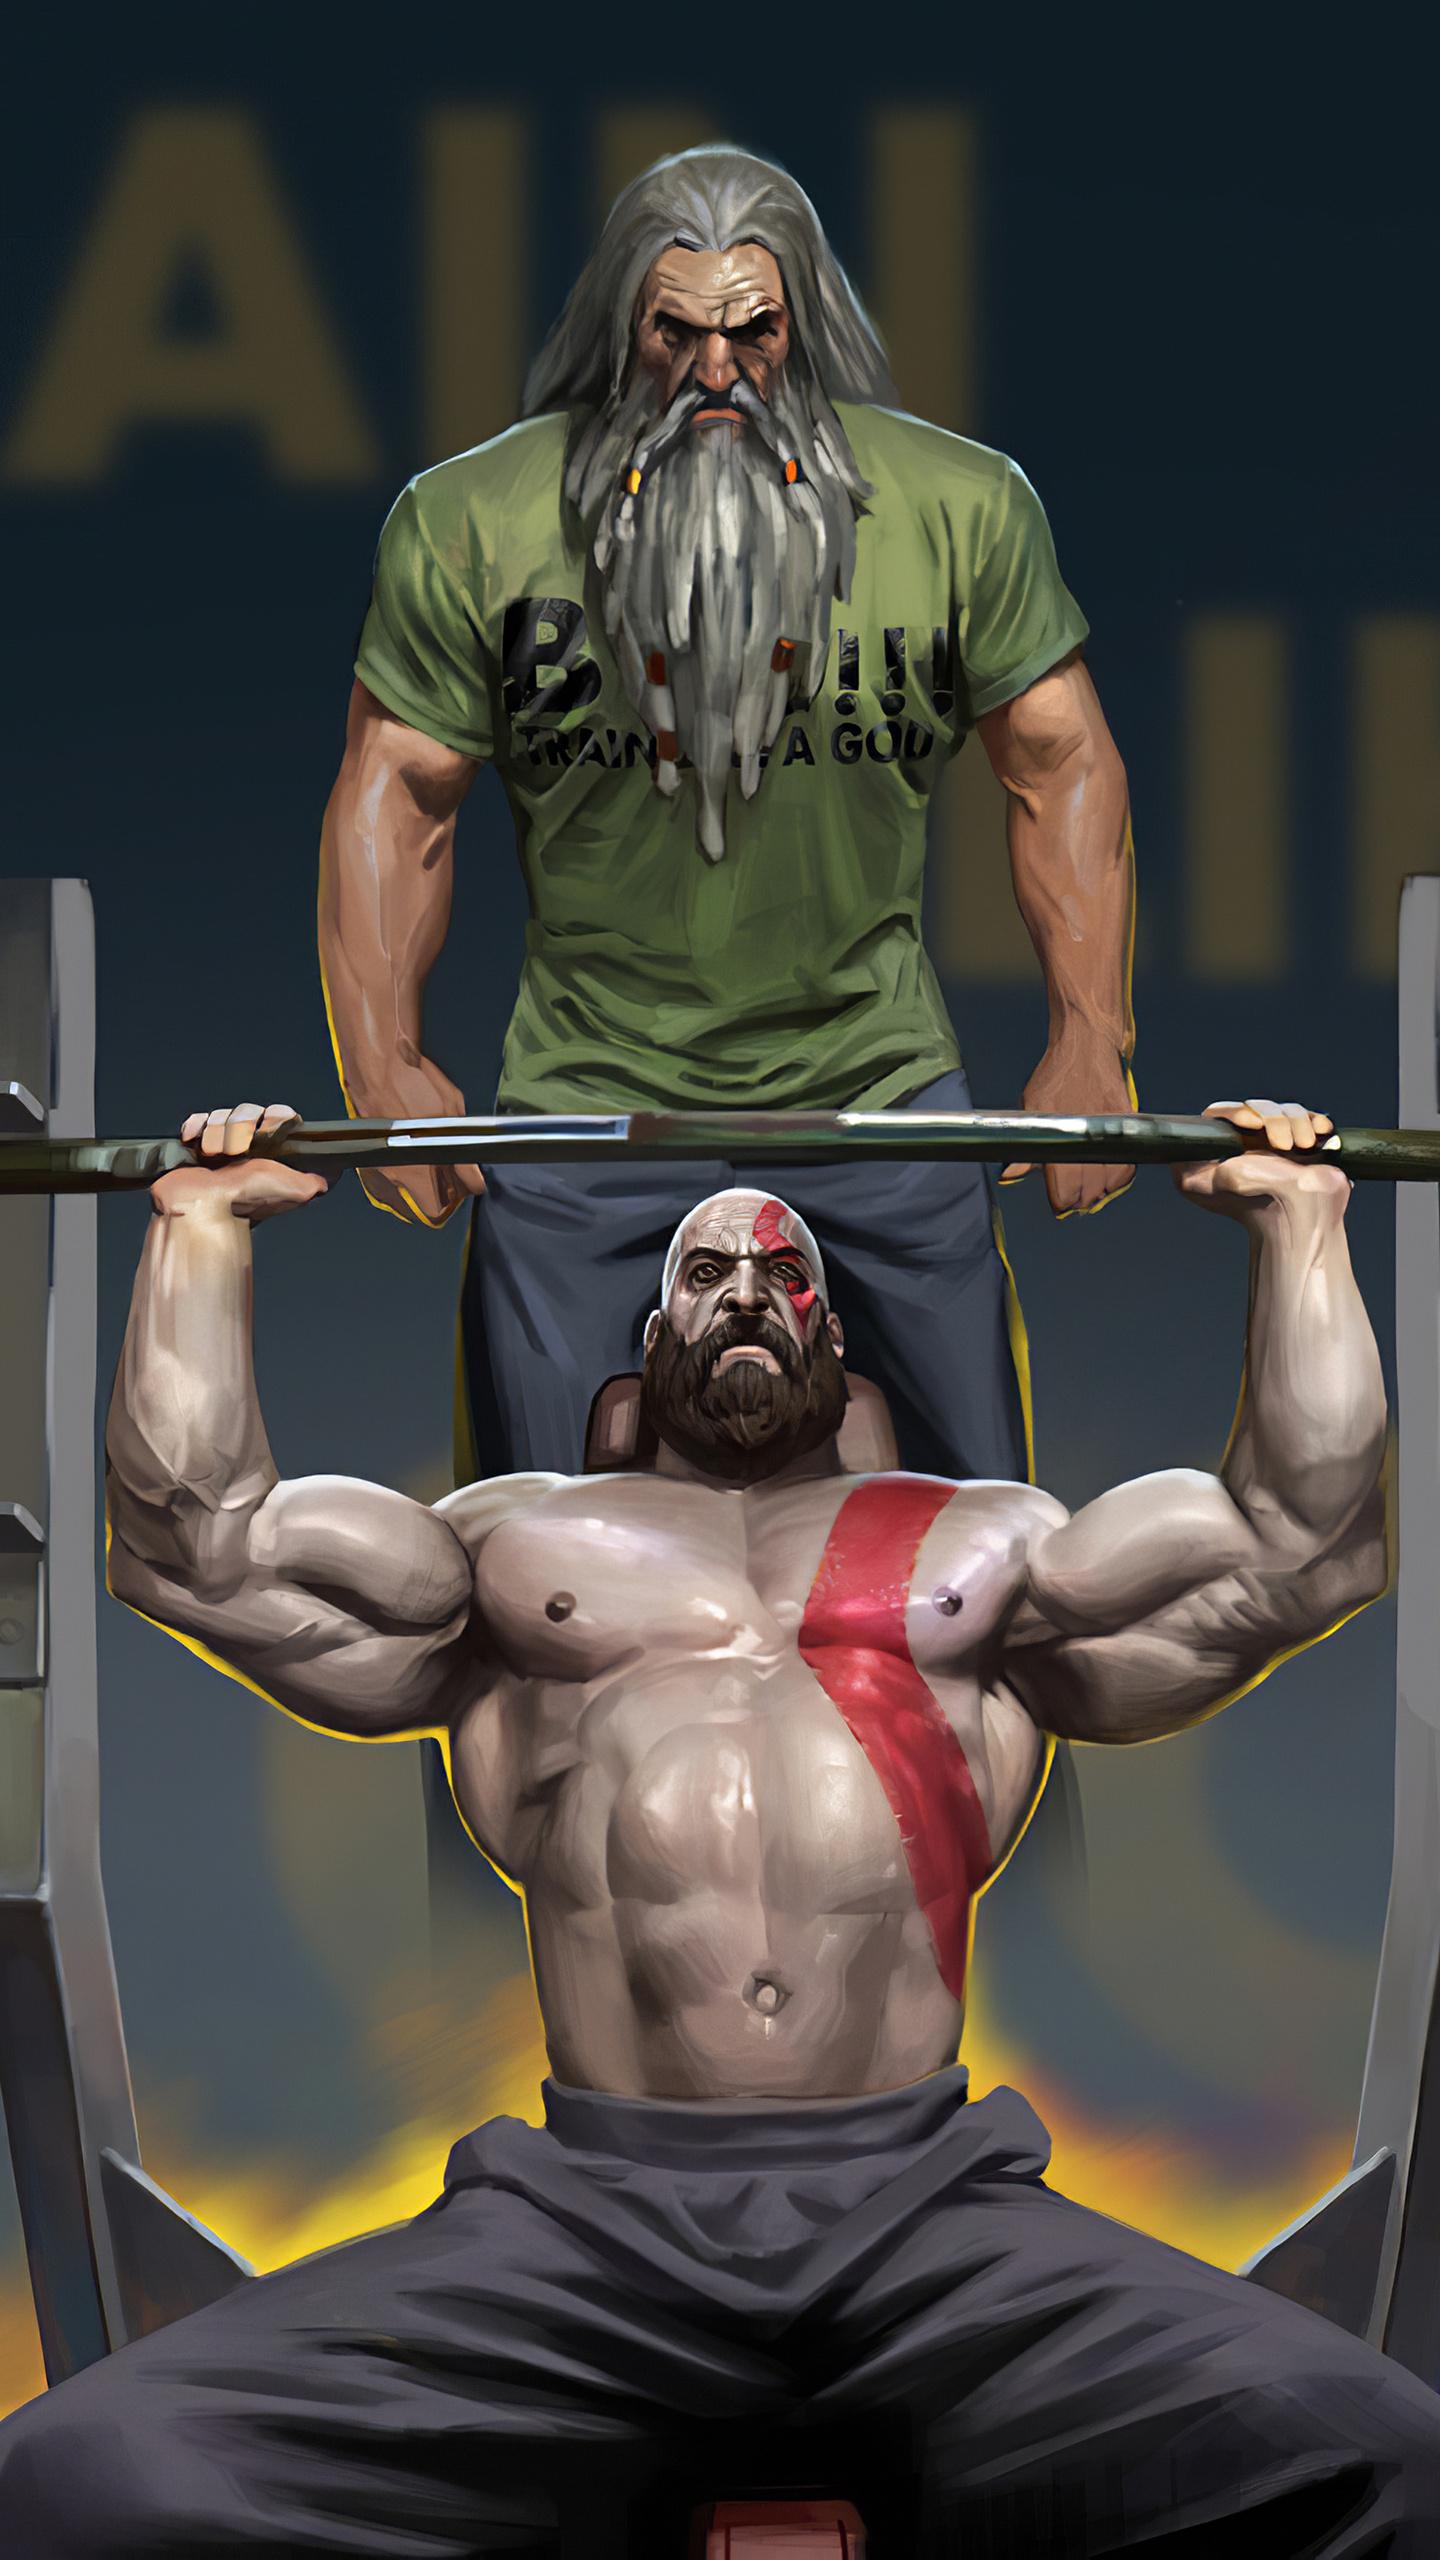 kratos-training-with-father-4k-uu.jpg